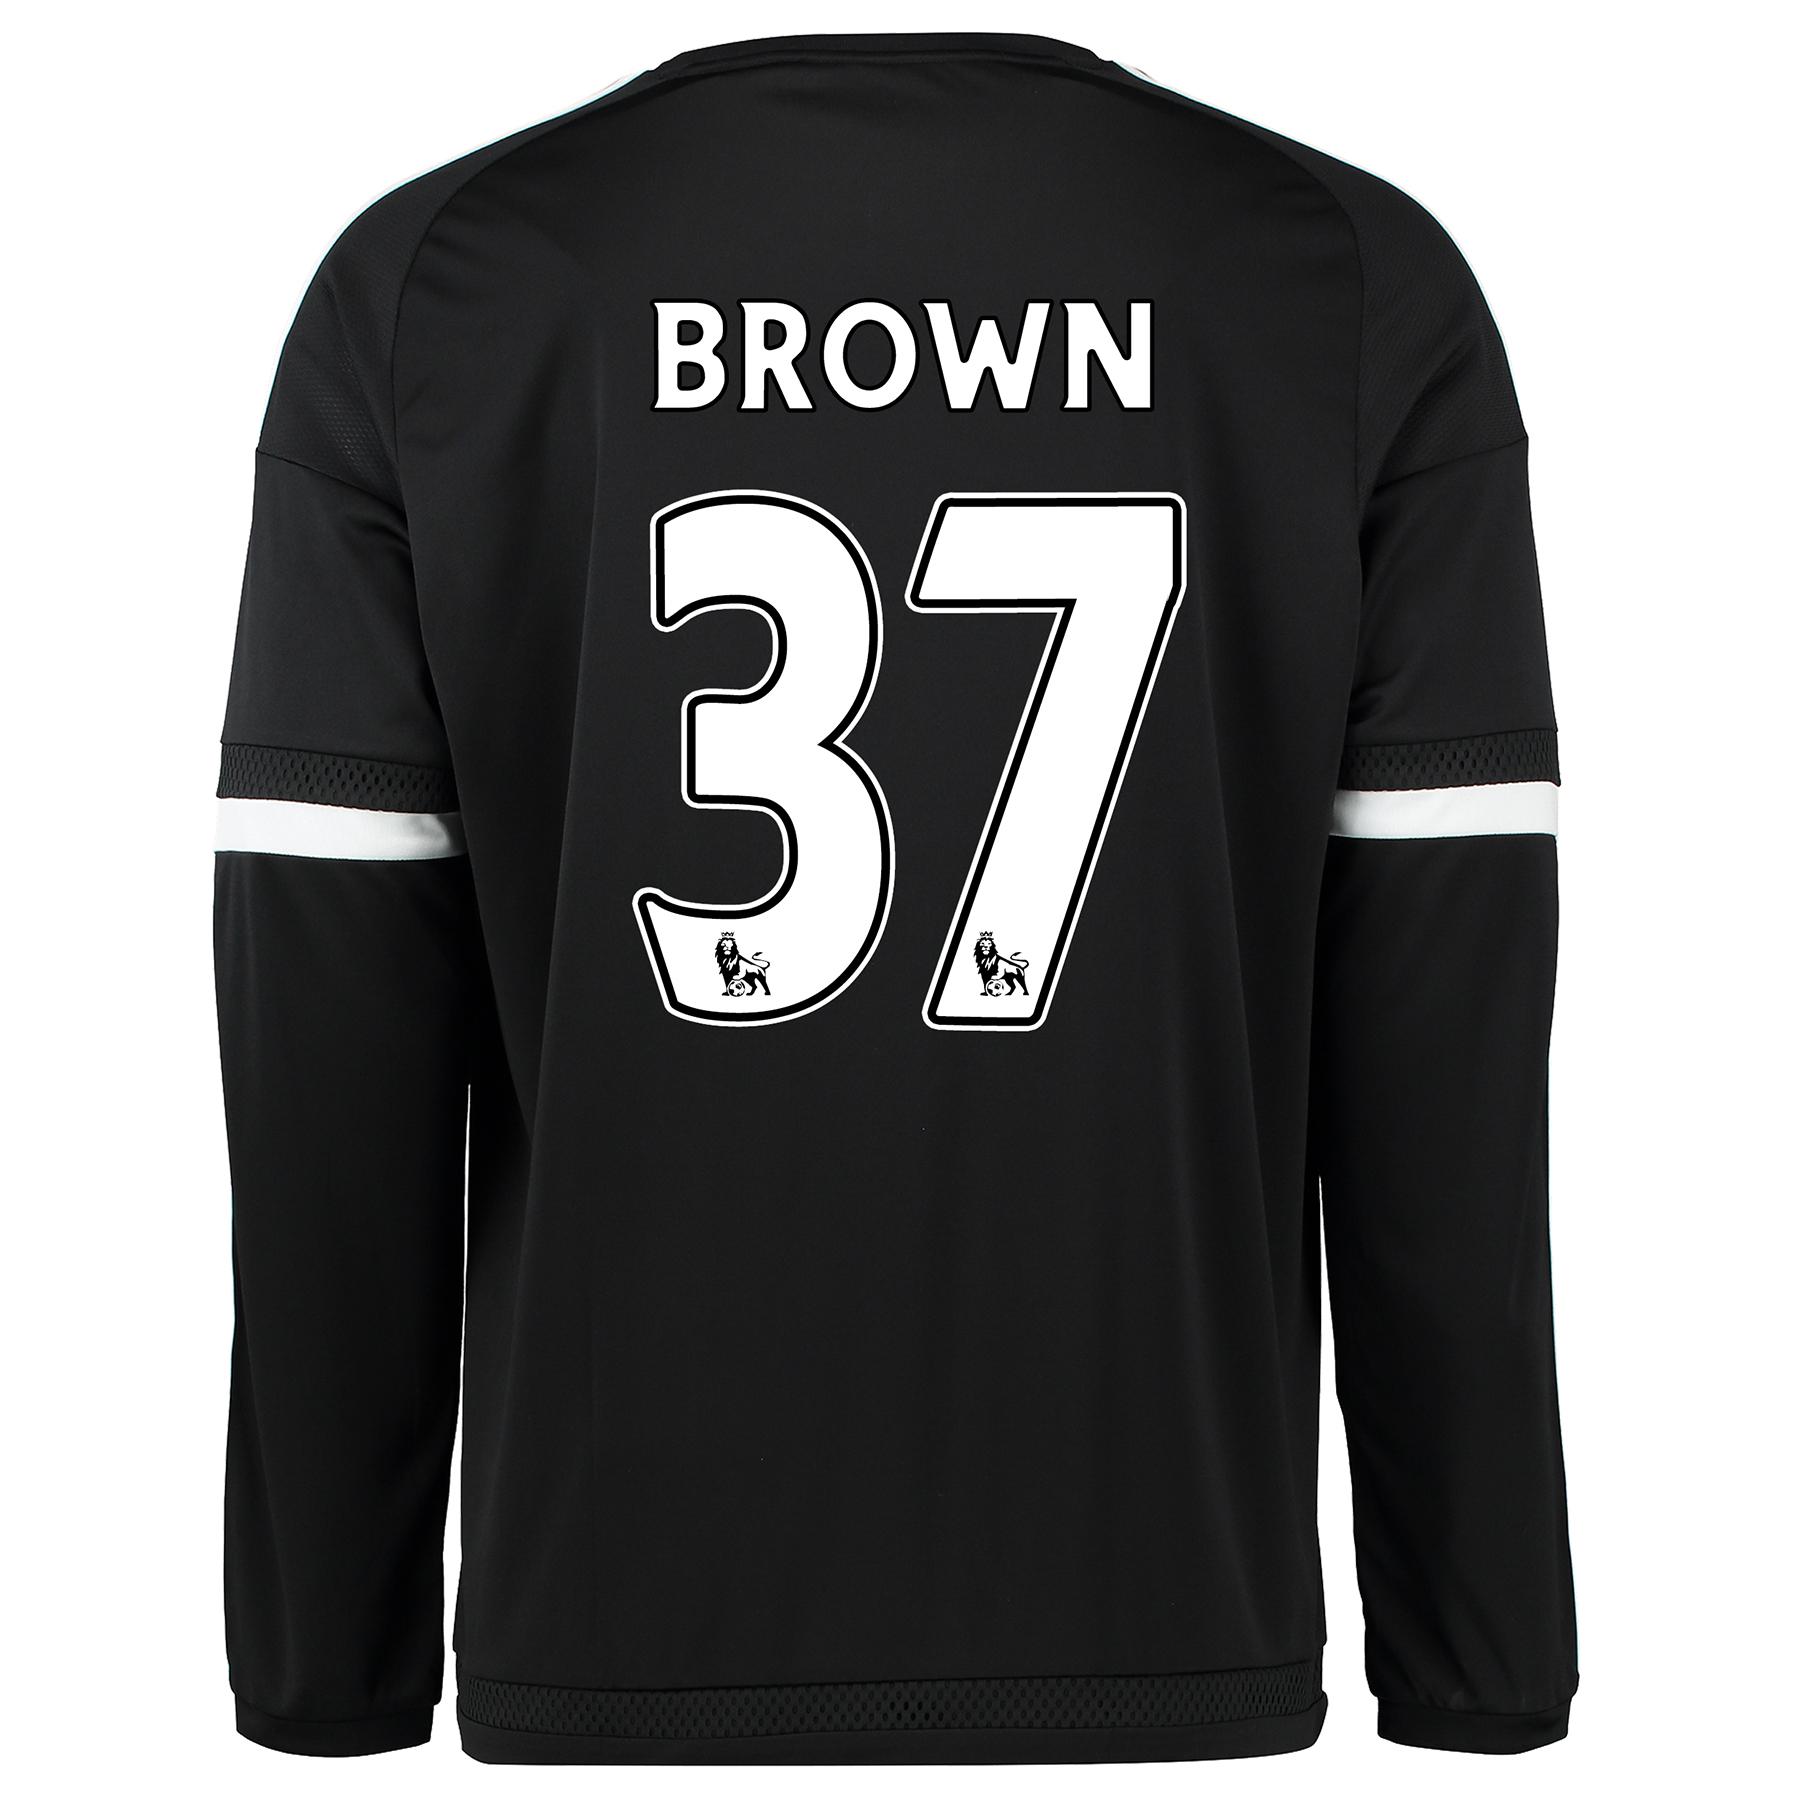 Chelsea Third Shirt 2015/16 - Long Sleeve Black with Brown 37 printing